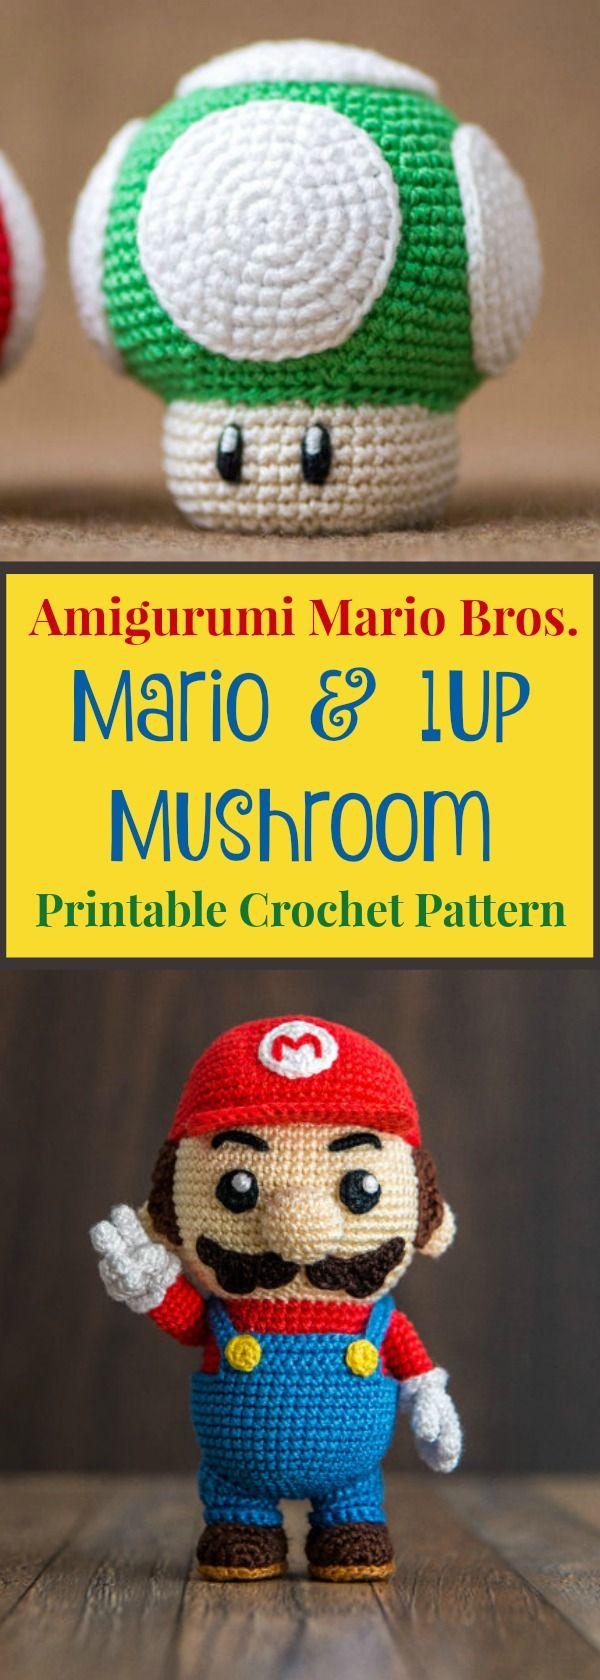 Creative Crochet: Amigurumi Mario & 1Up Mushroom Crochet Pattern ...